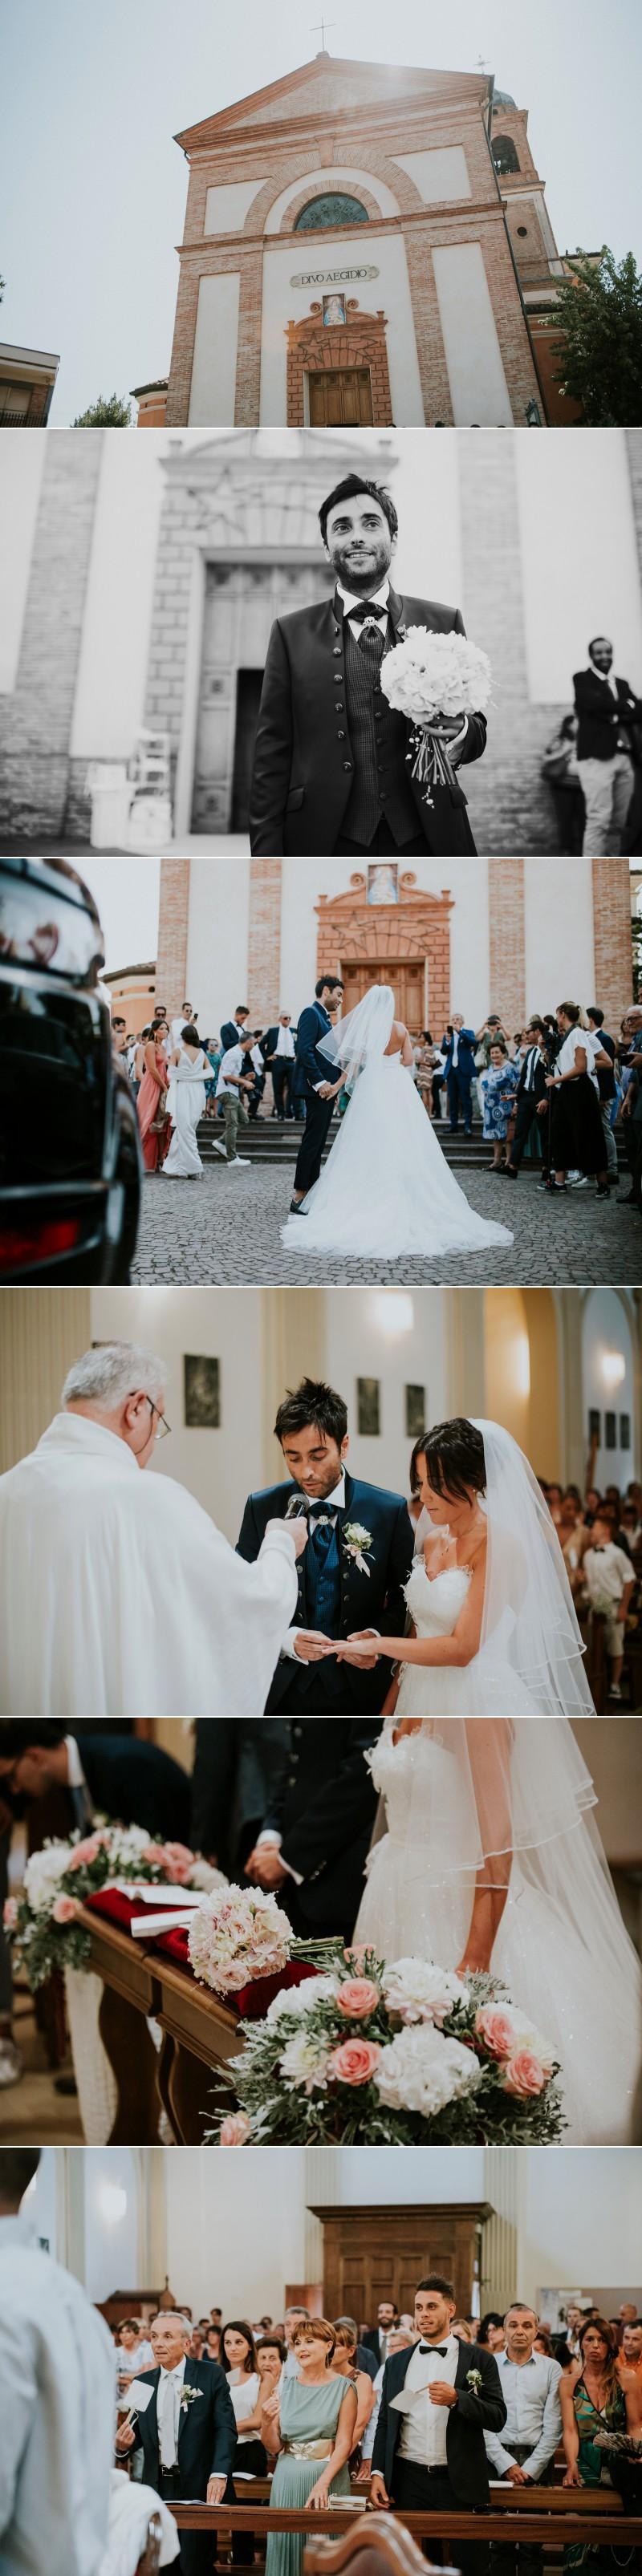 Fotografo Matrimonio Casa Celincordia Cesena 500